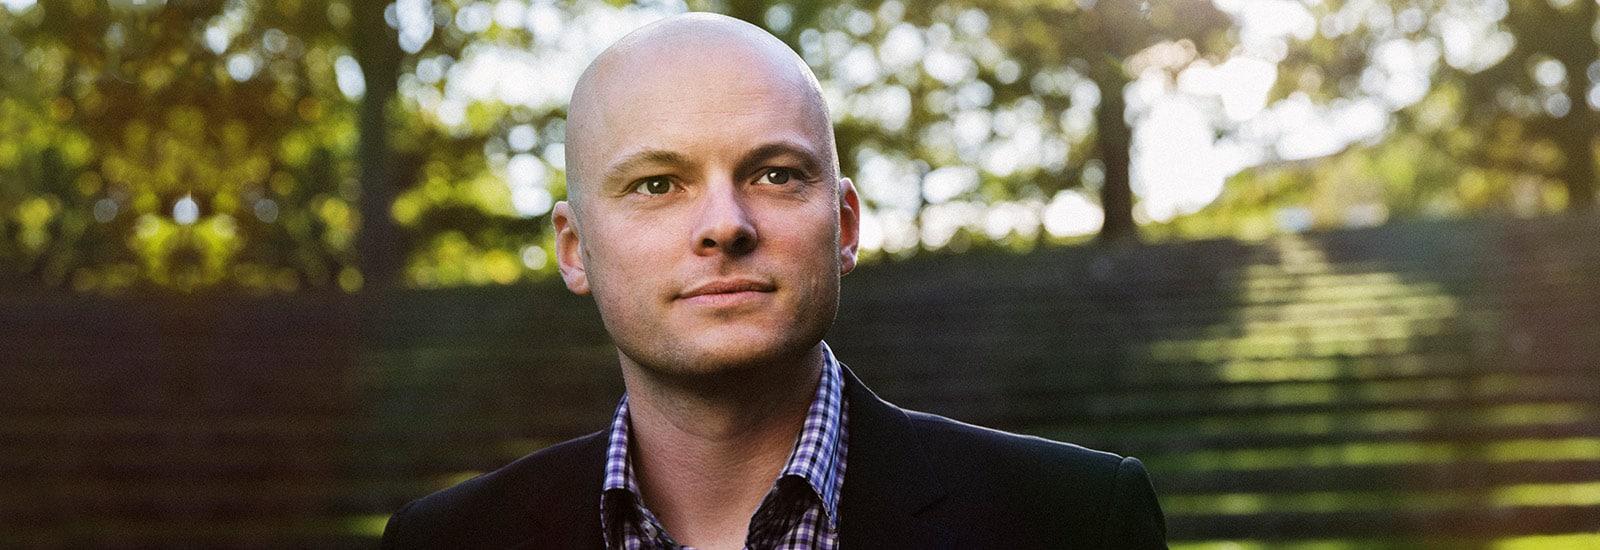 Christian Waldstrøm Foredrag